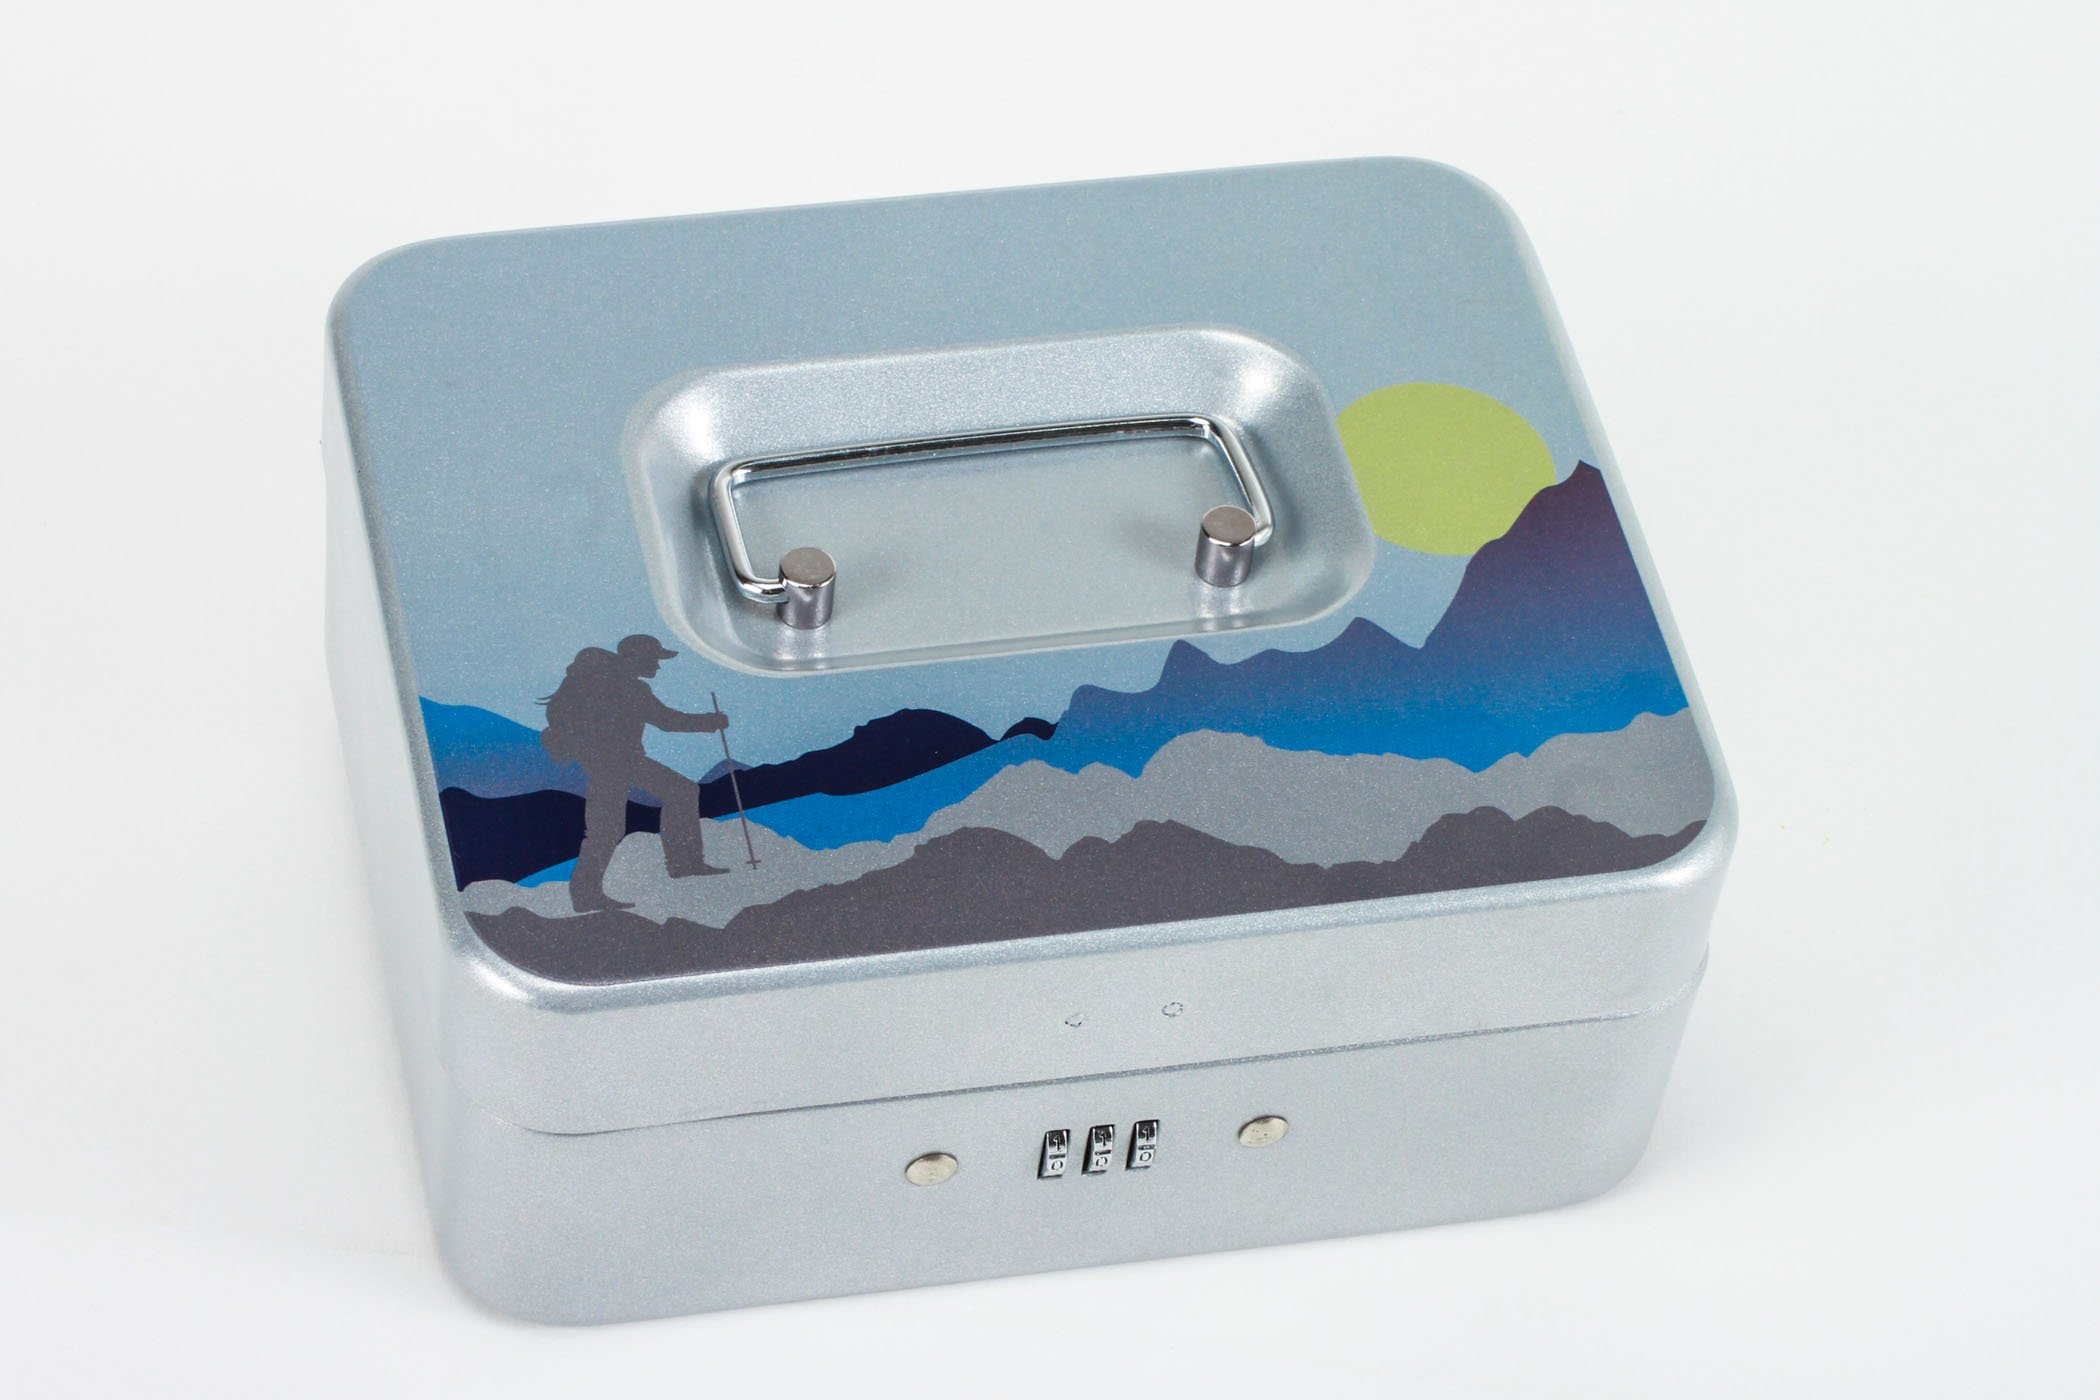 Mountineer Hiker | Personal Combination Lock Box | Medication Lock Box (Silver, Small)